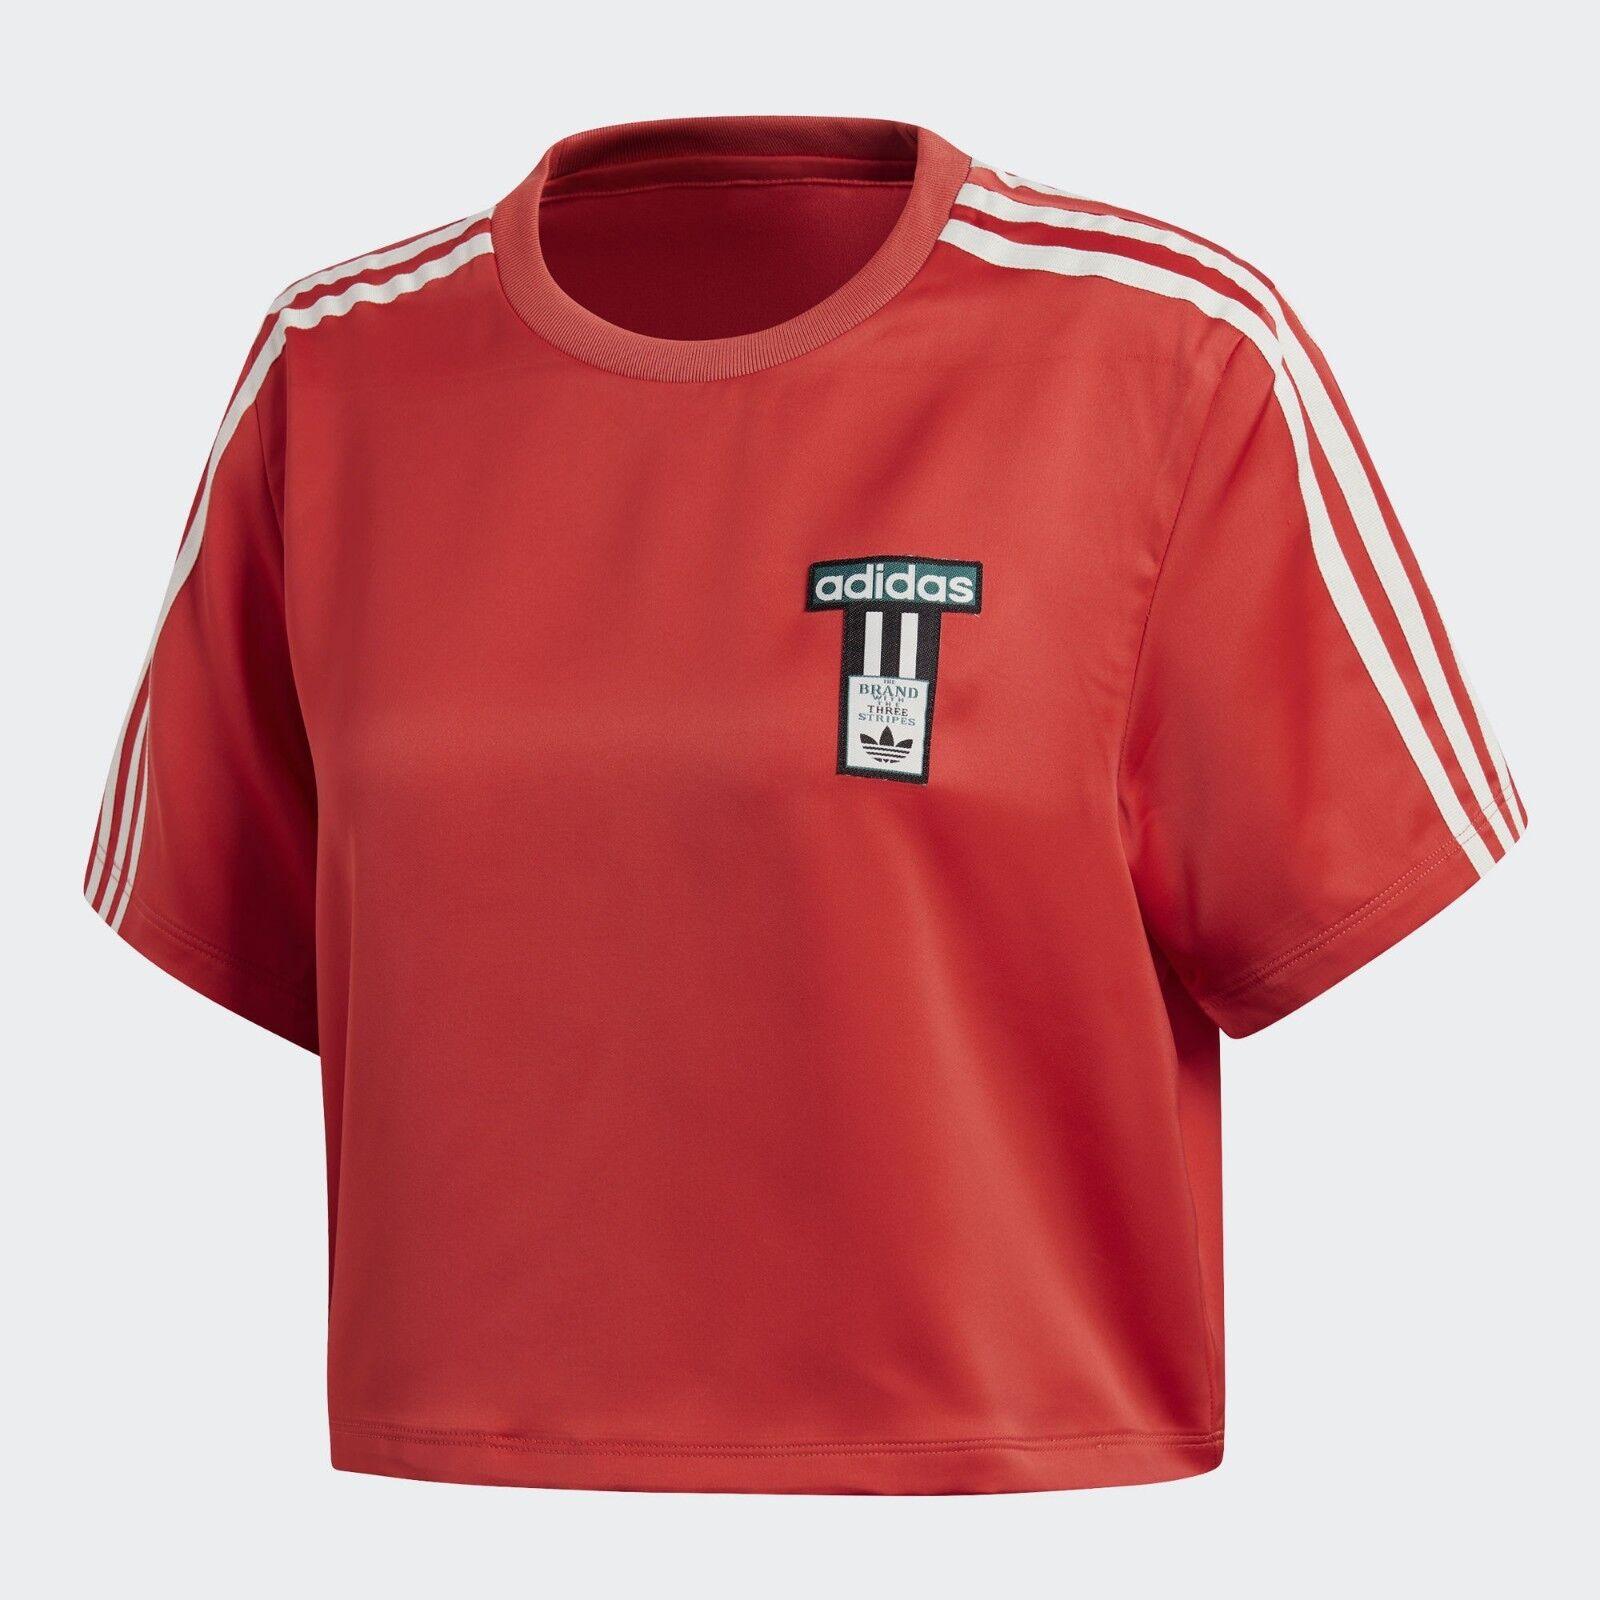 Adidas Originals Women's ADIBREAK SATIN CROPPED T-Shirt Amazon Red DH4599 c